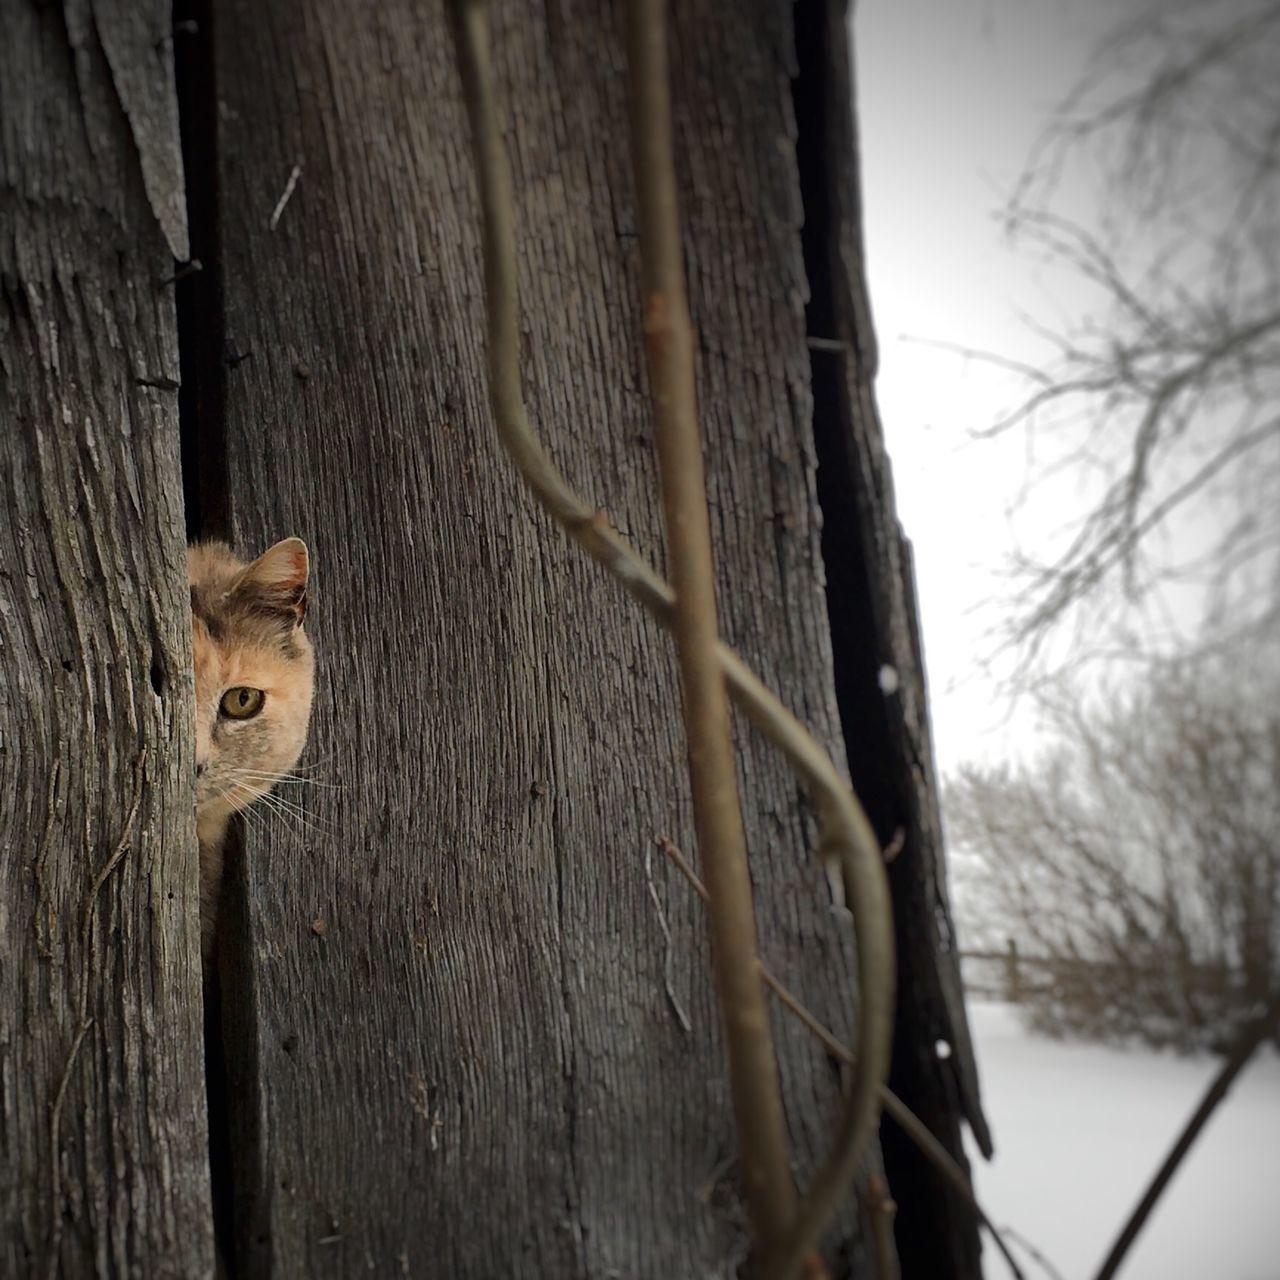 Cat Peeping Through Wooden Wall